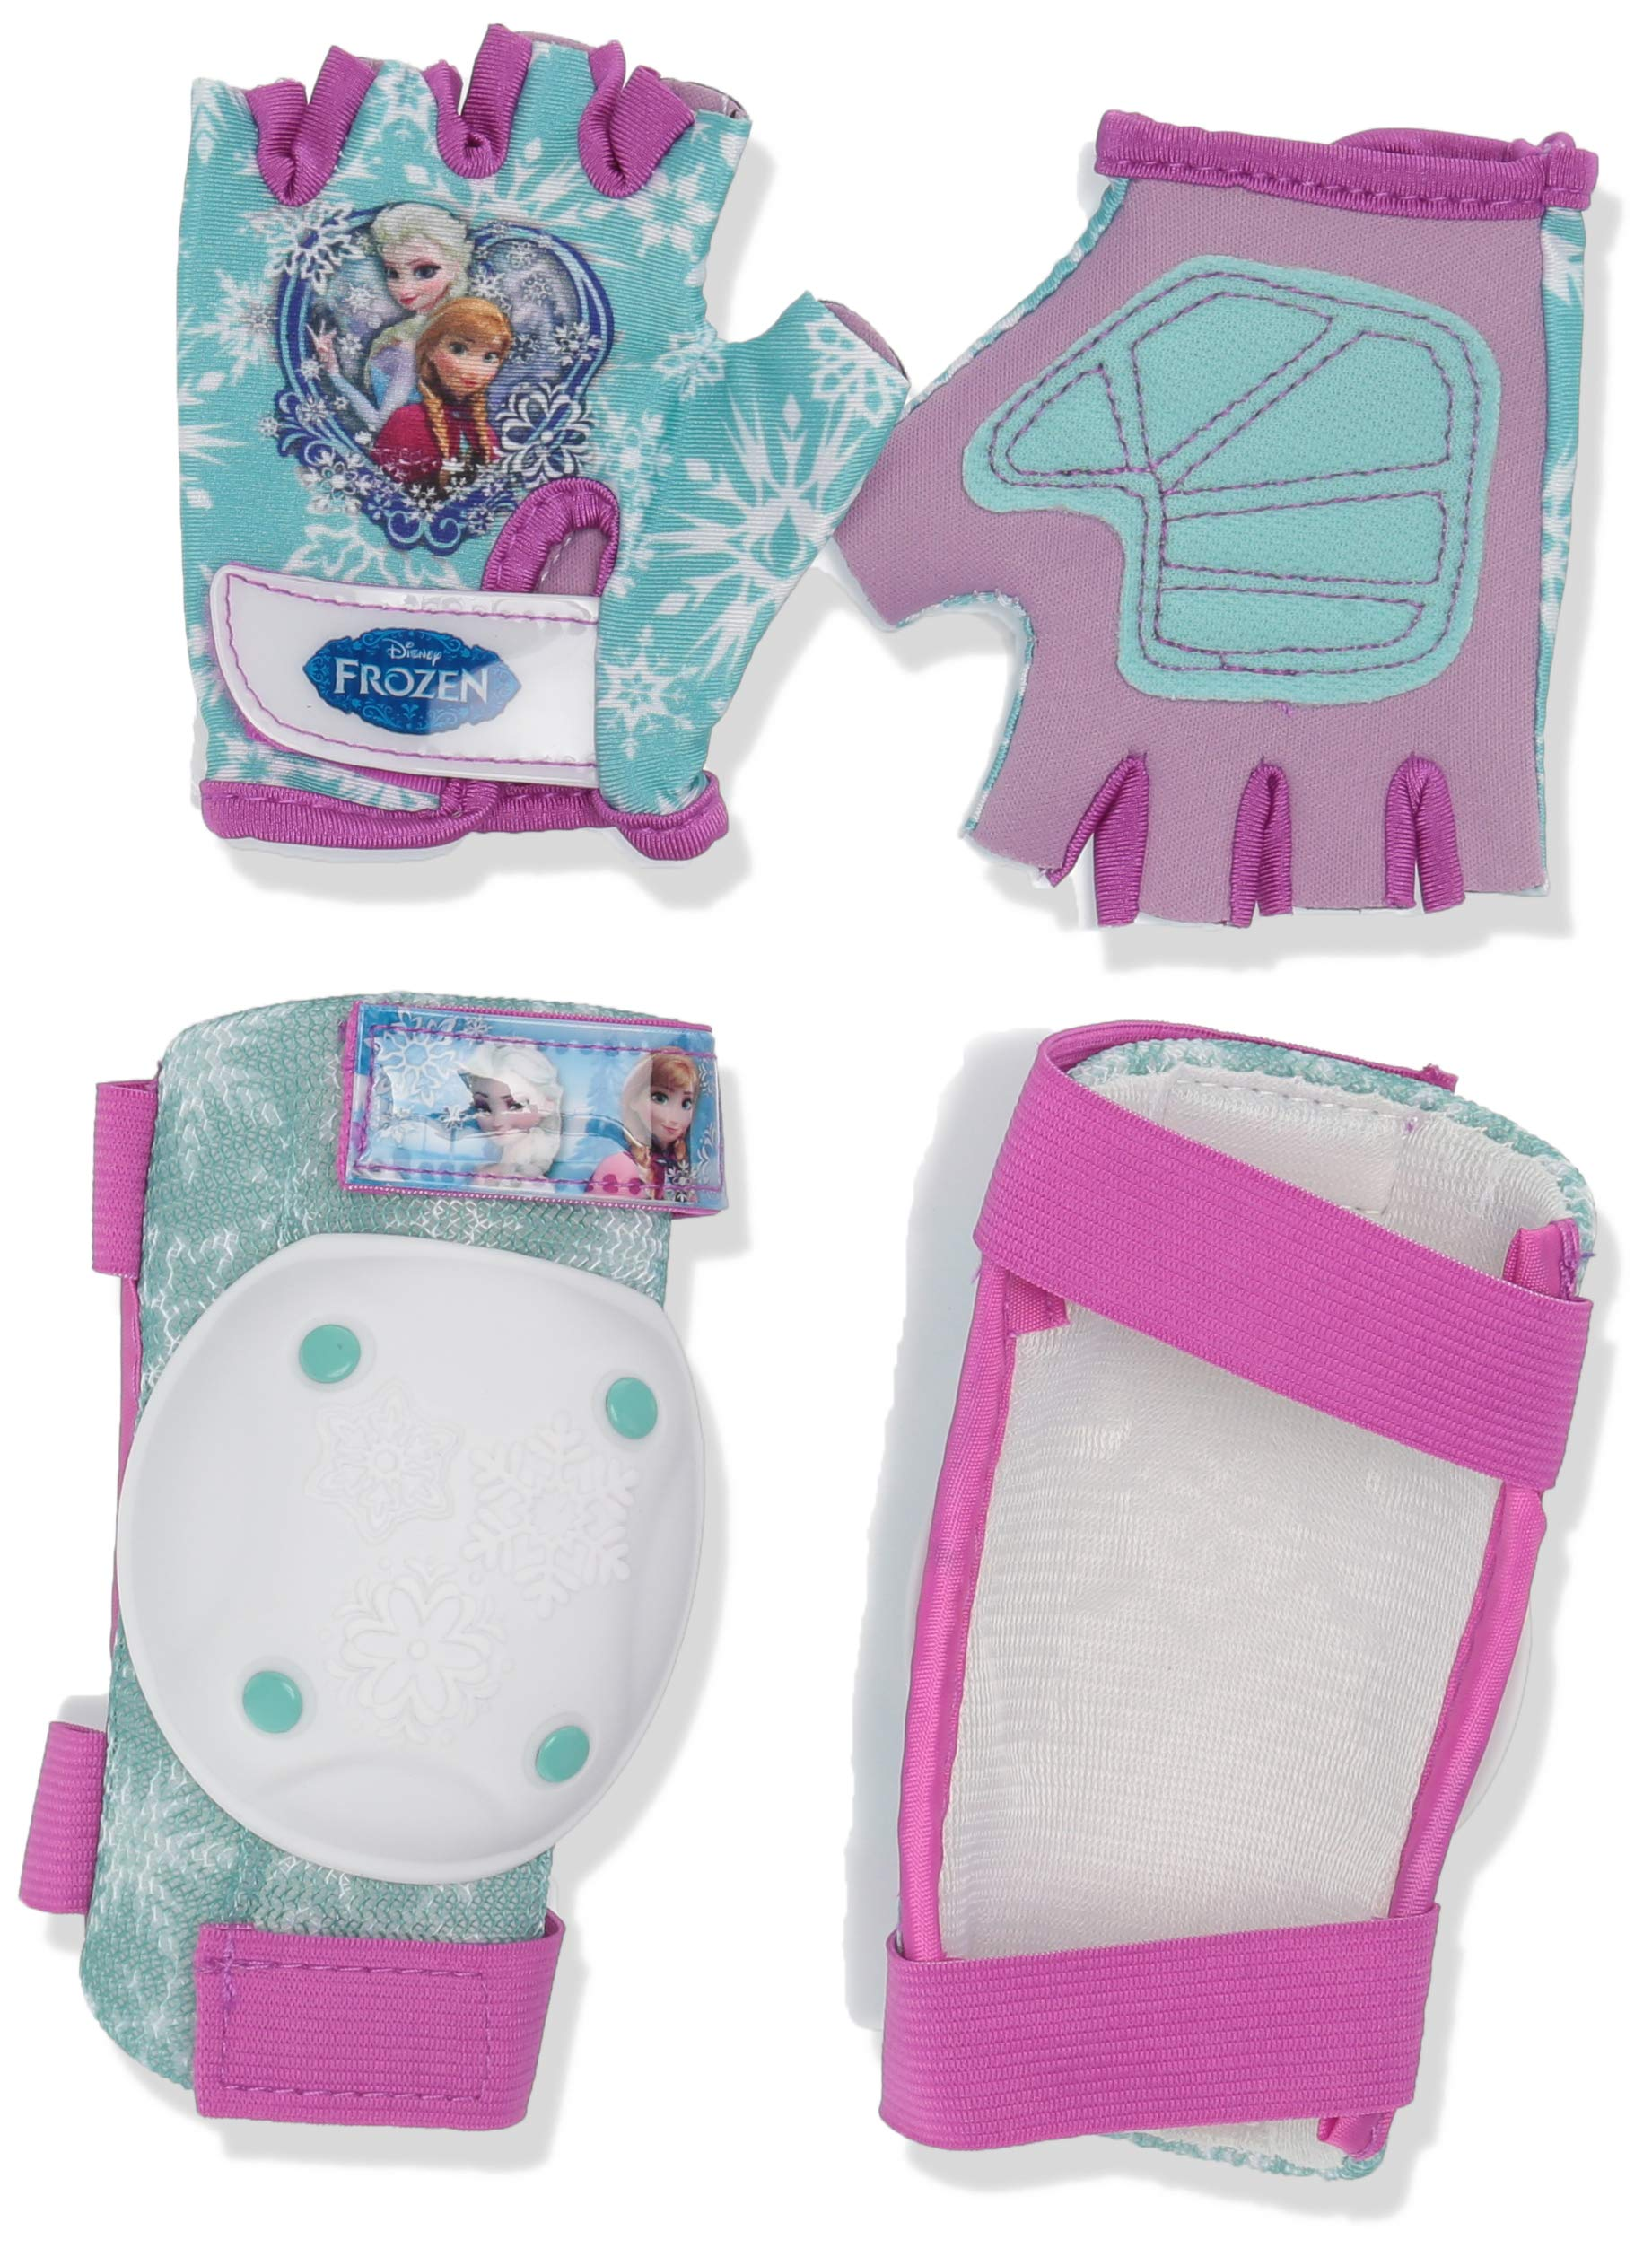 Bell Disney Frozen Pad and Glove Set